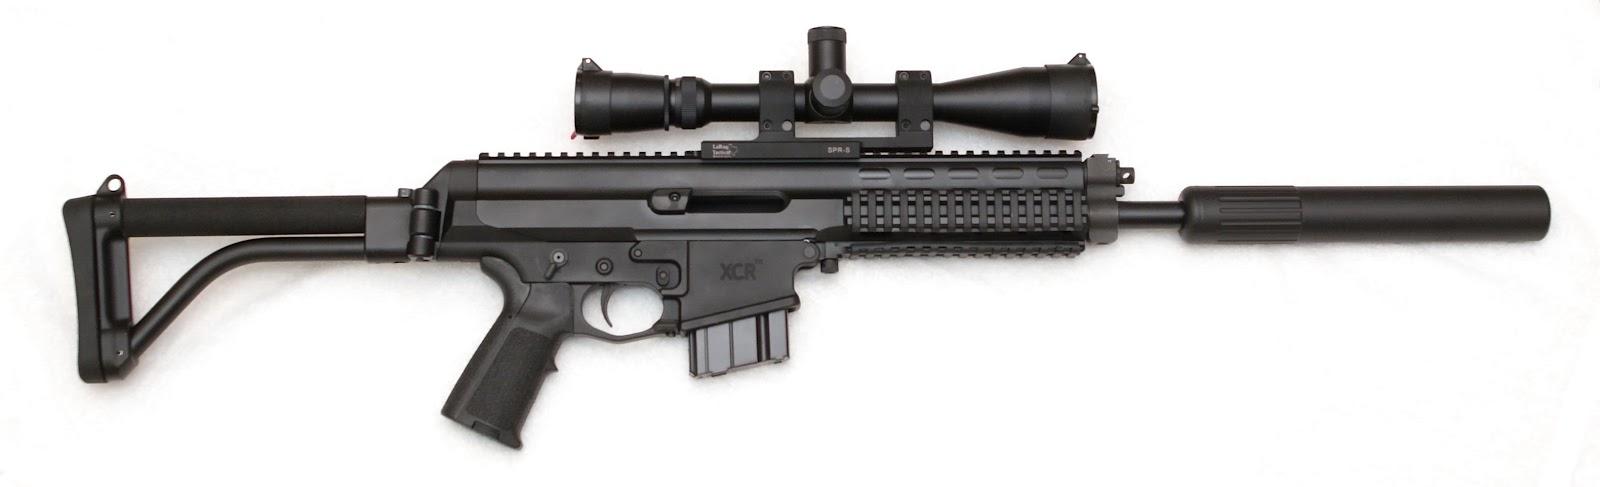 gemtech suppressor diagram gemtech foor177 rifle schematic diagram rh nn1uuvfo 101drivers info